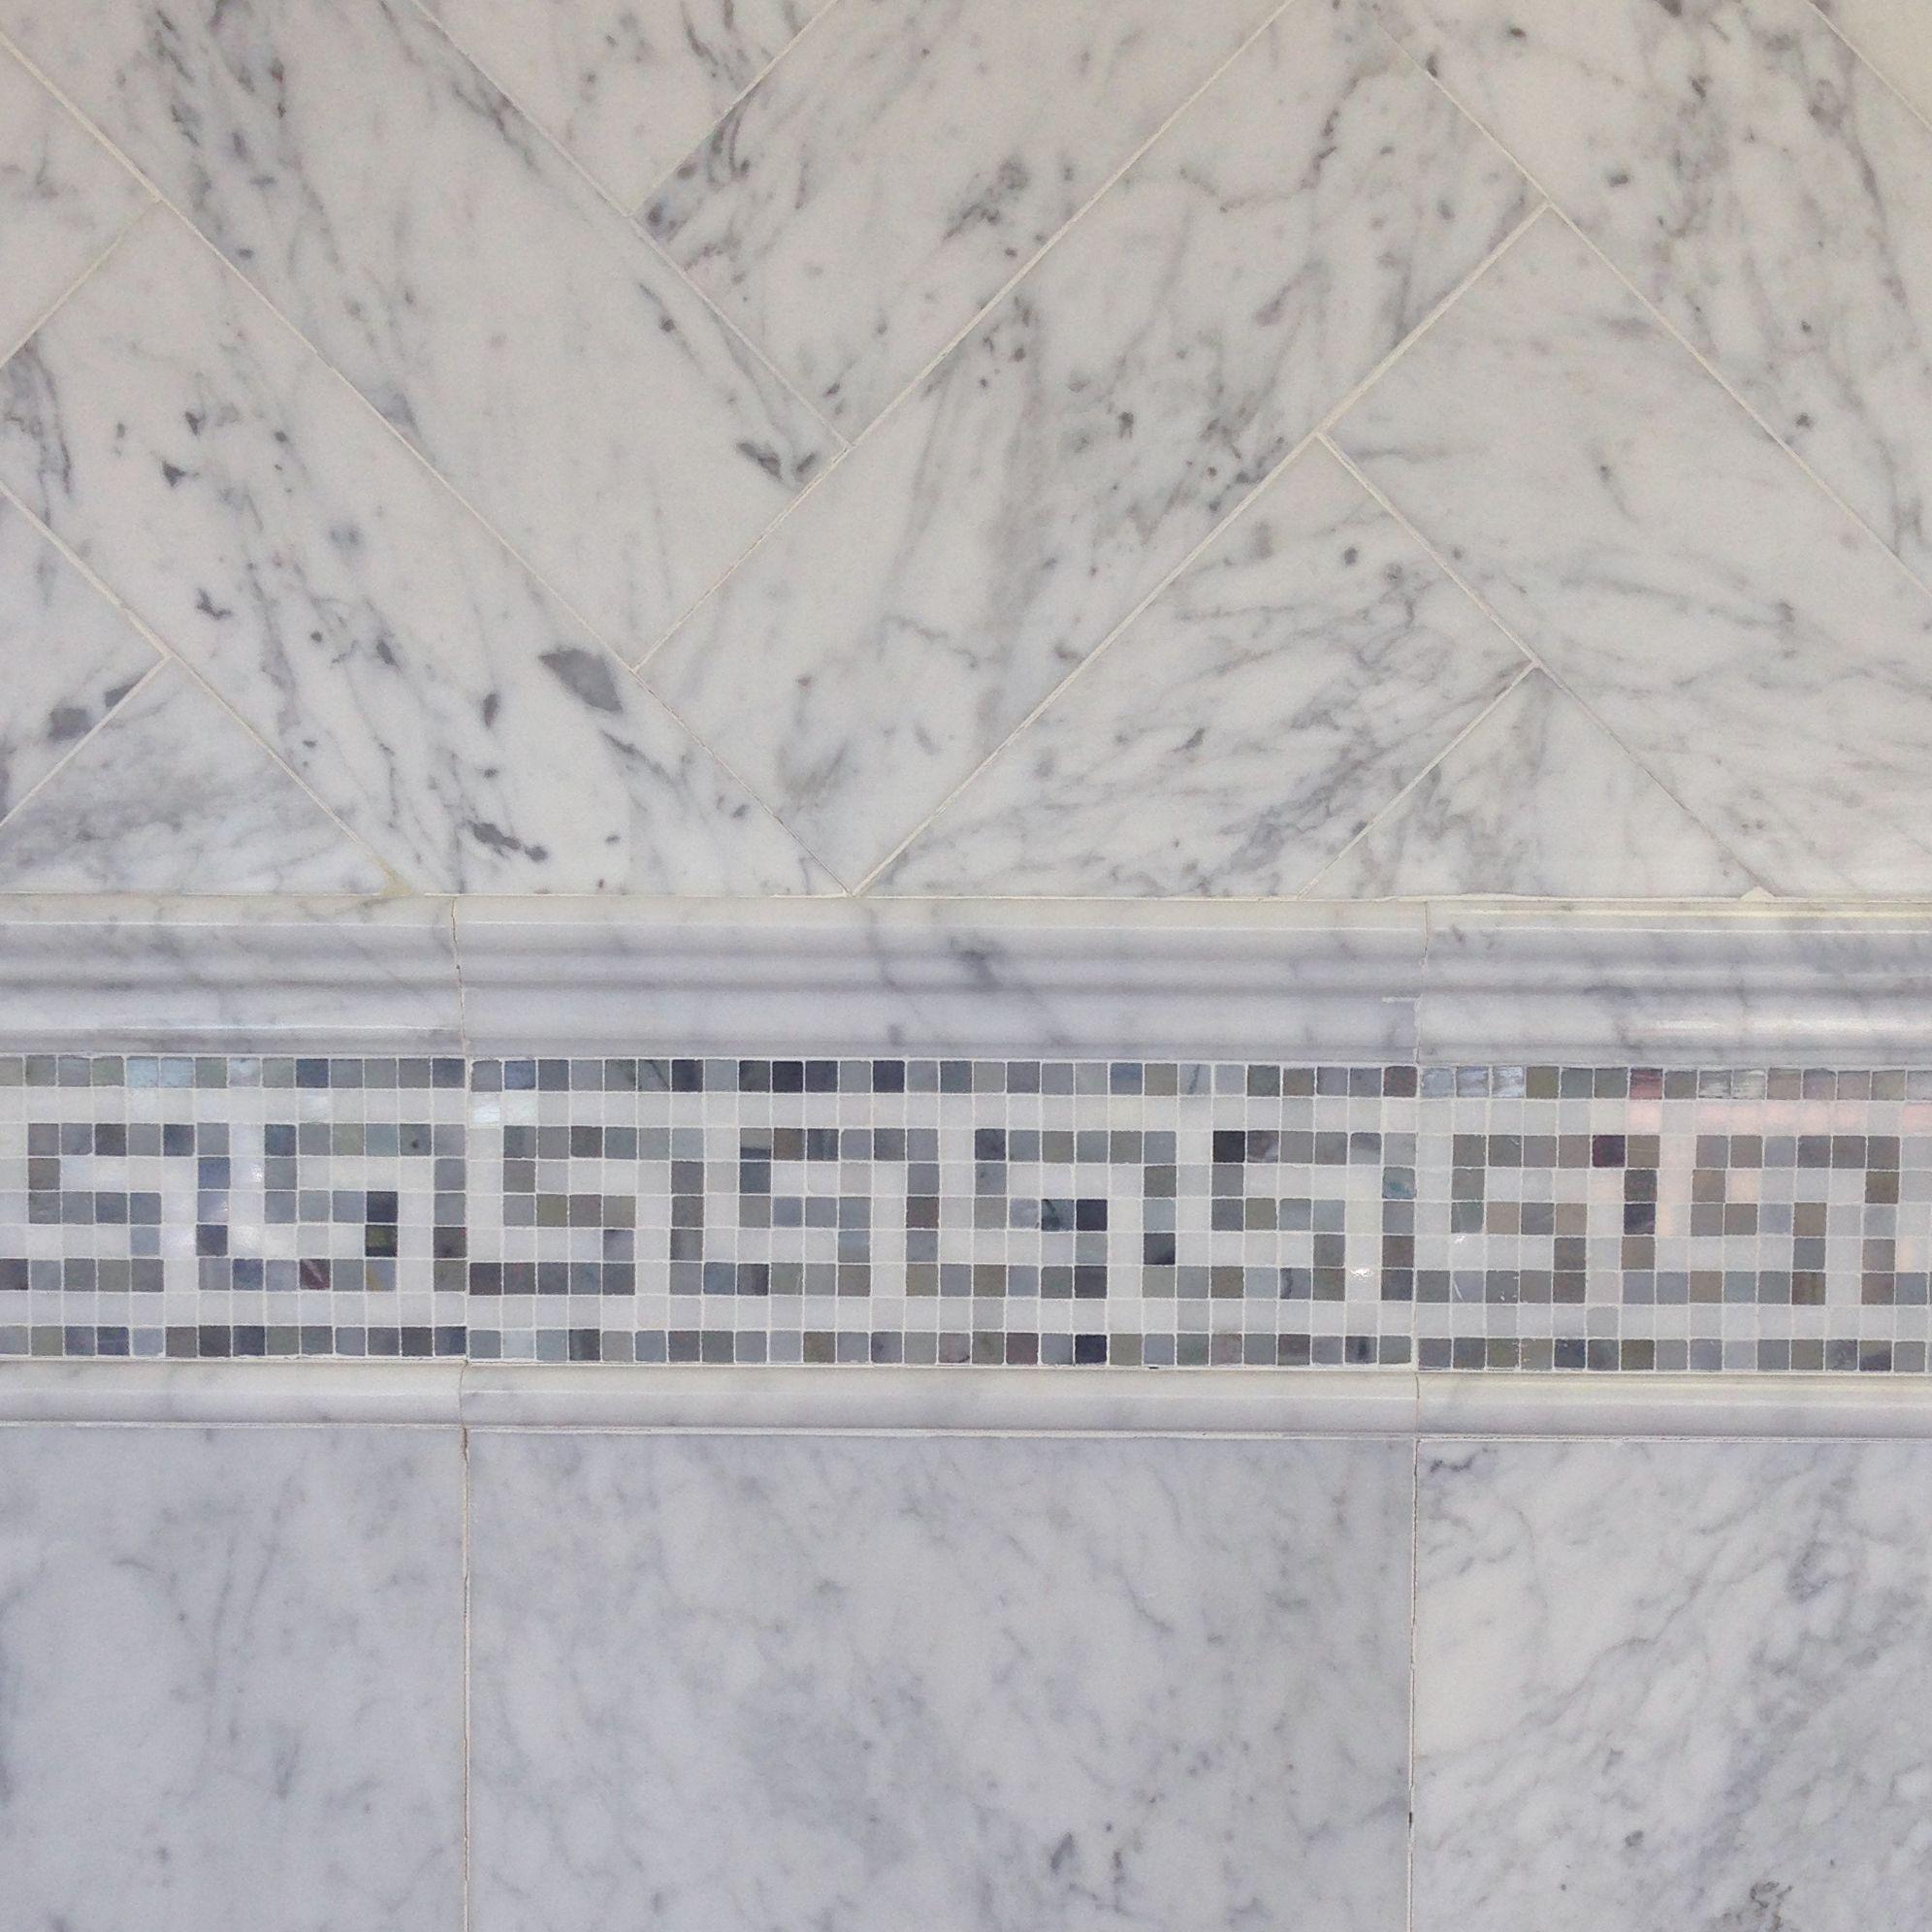 6 12 Bianco Carrara Marble Tile With Greek Key Border And